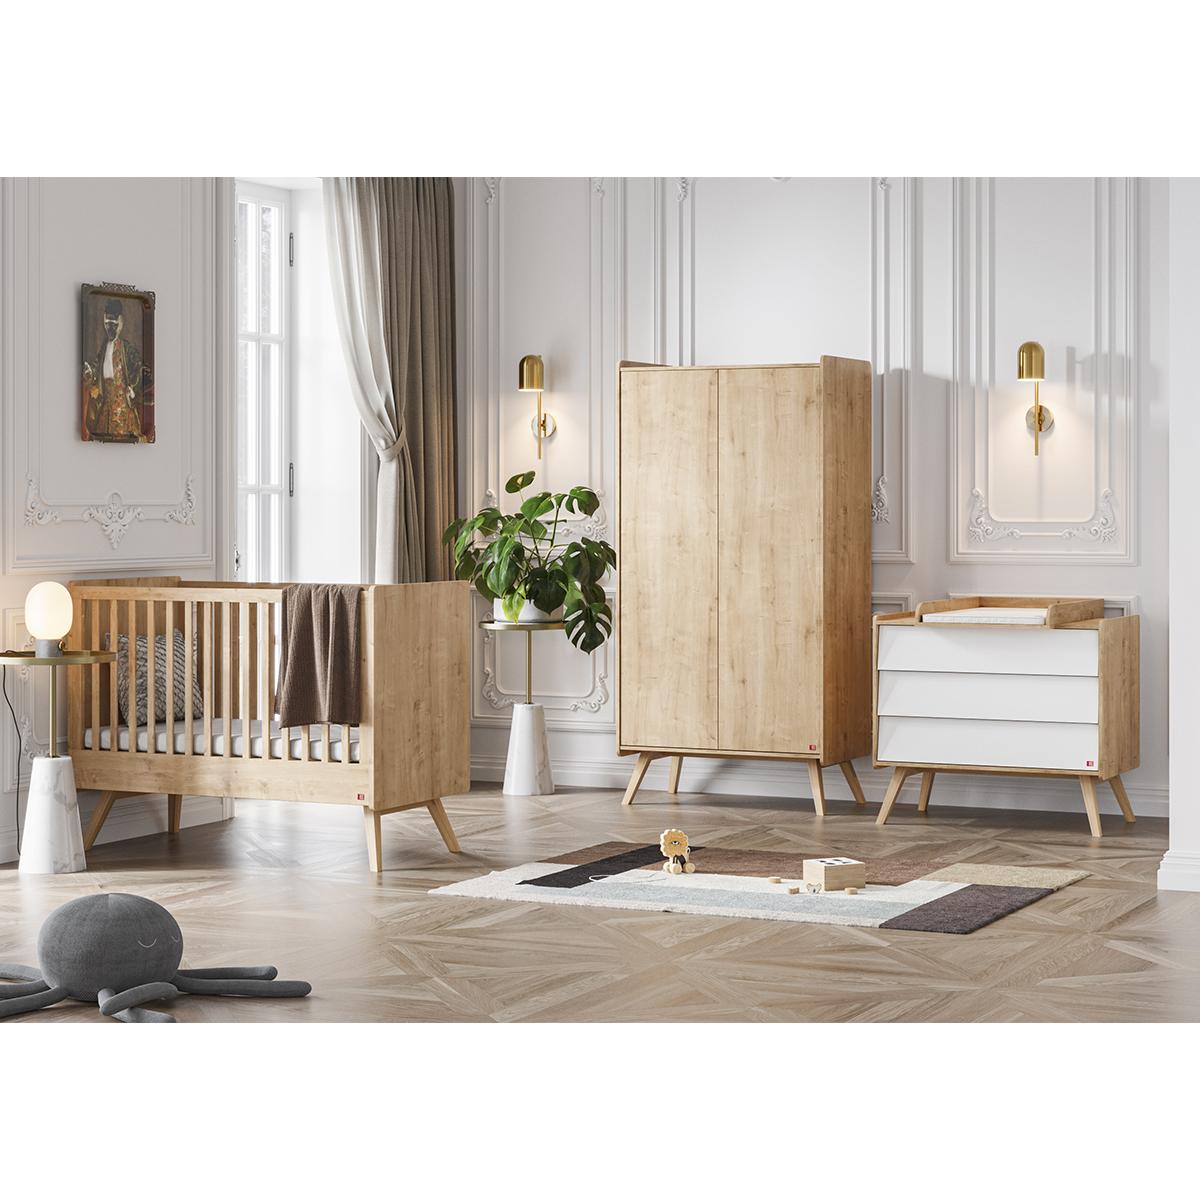 vox_vintage_chambre_bebe_armoire_blanc_1